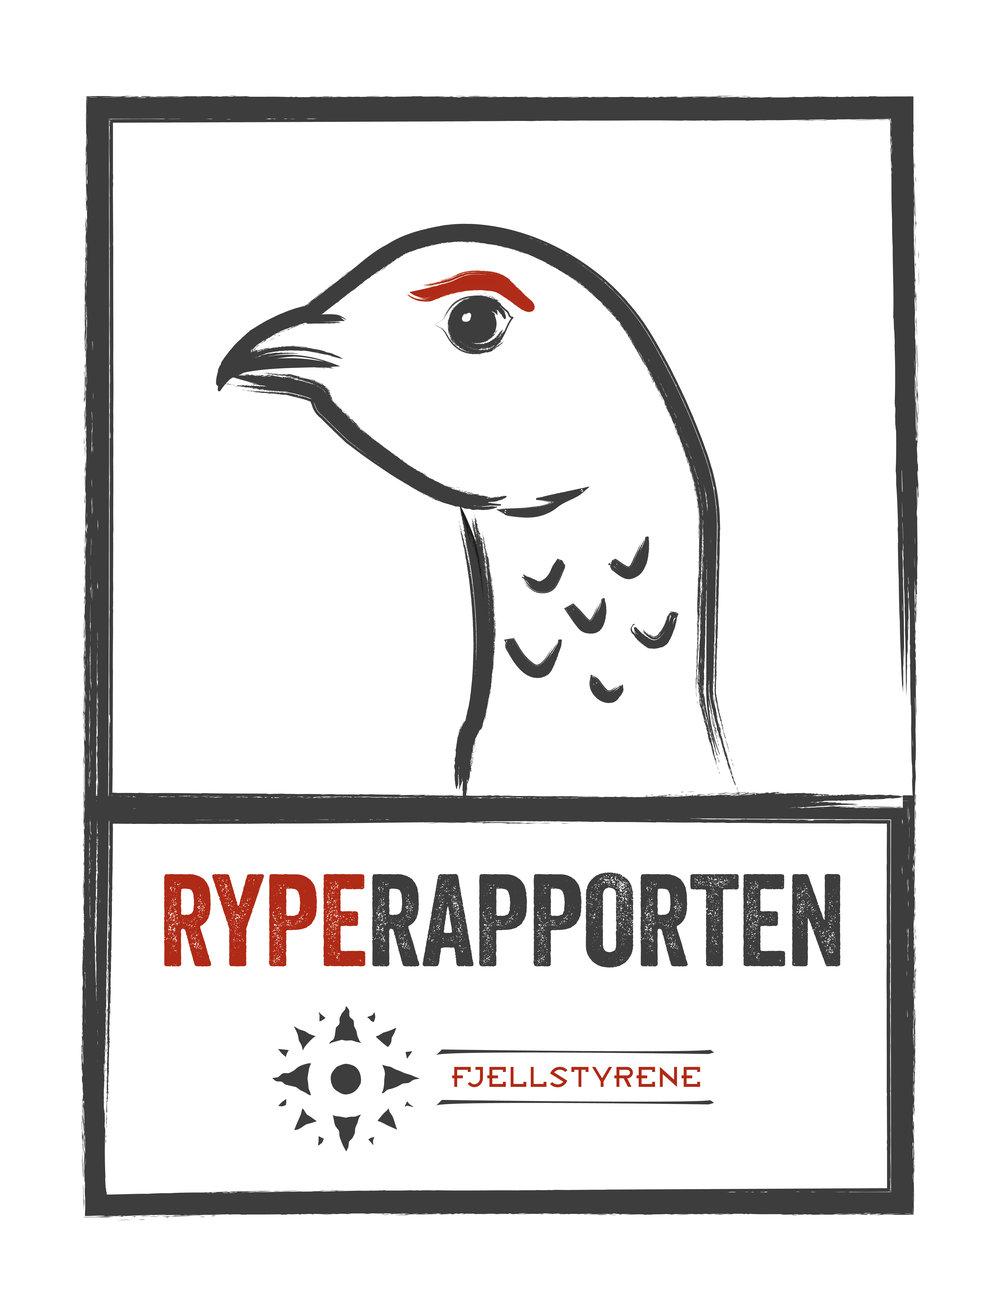 Ryperapporten-logo-02.jpg